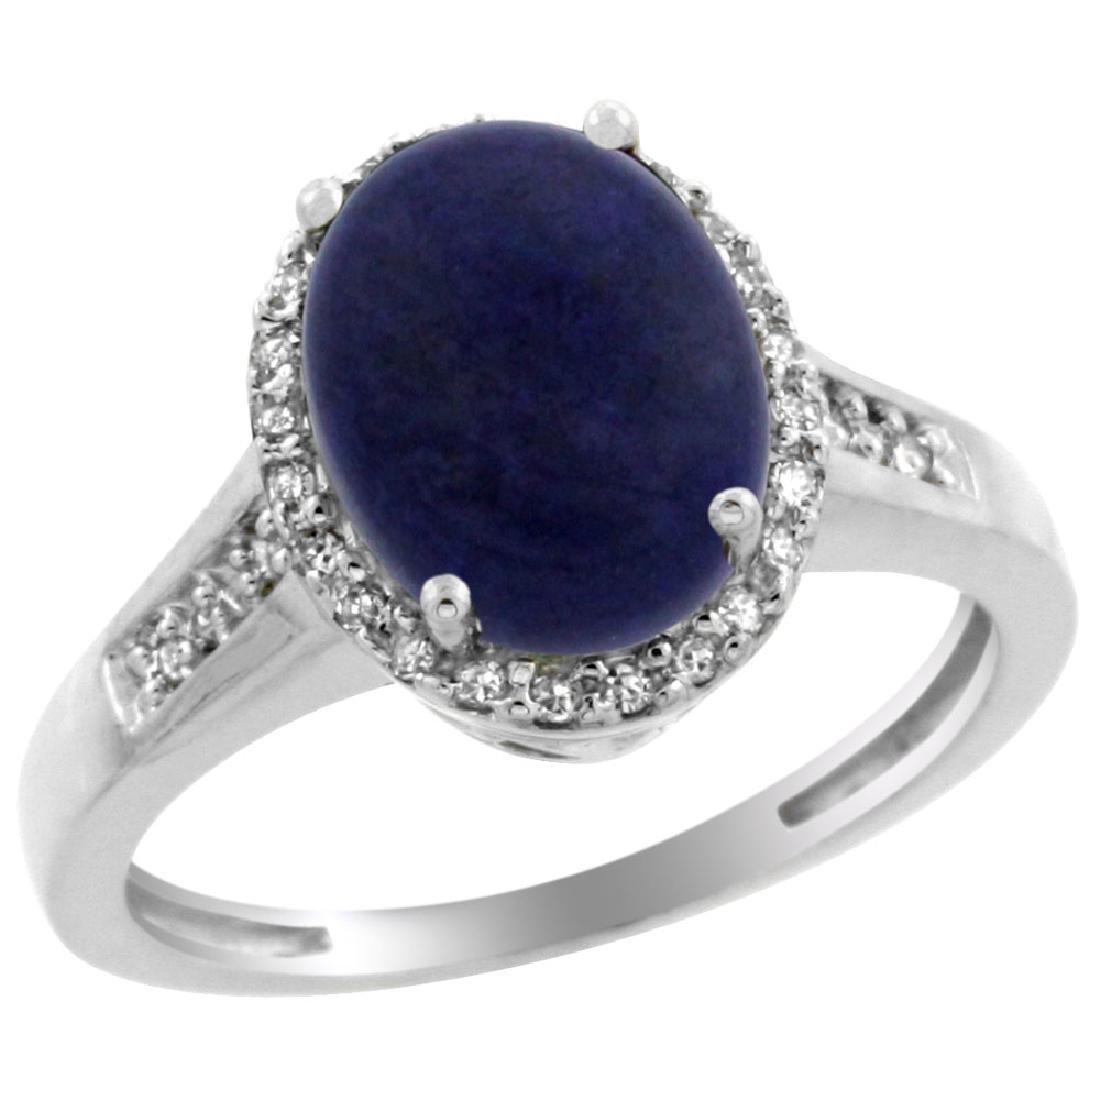 Natural 2.49 ctw Lapis & Diamond Engagement Ring 14K